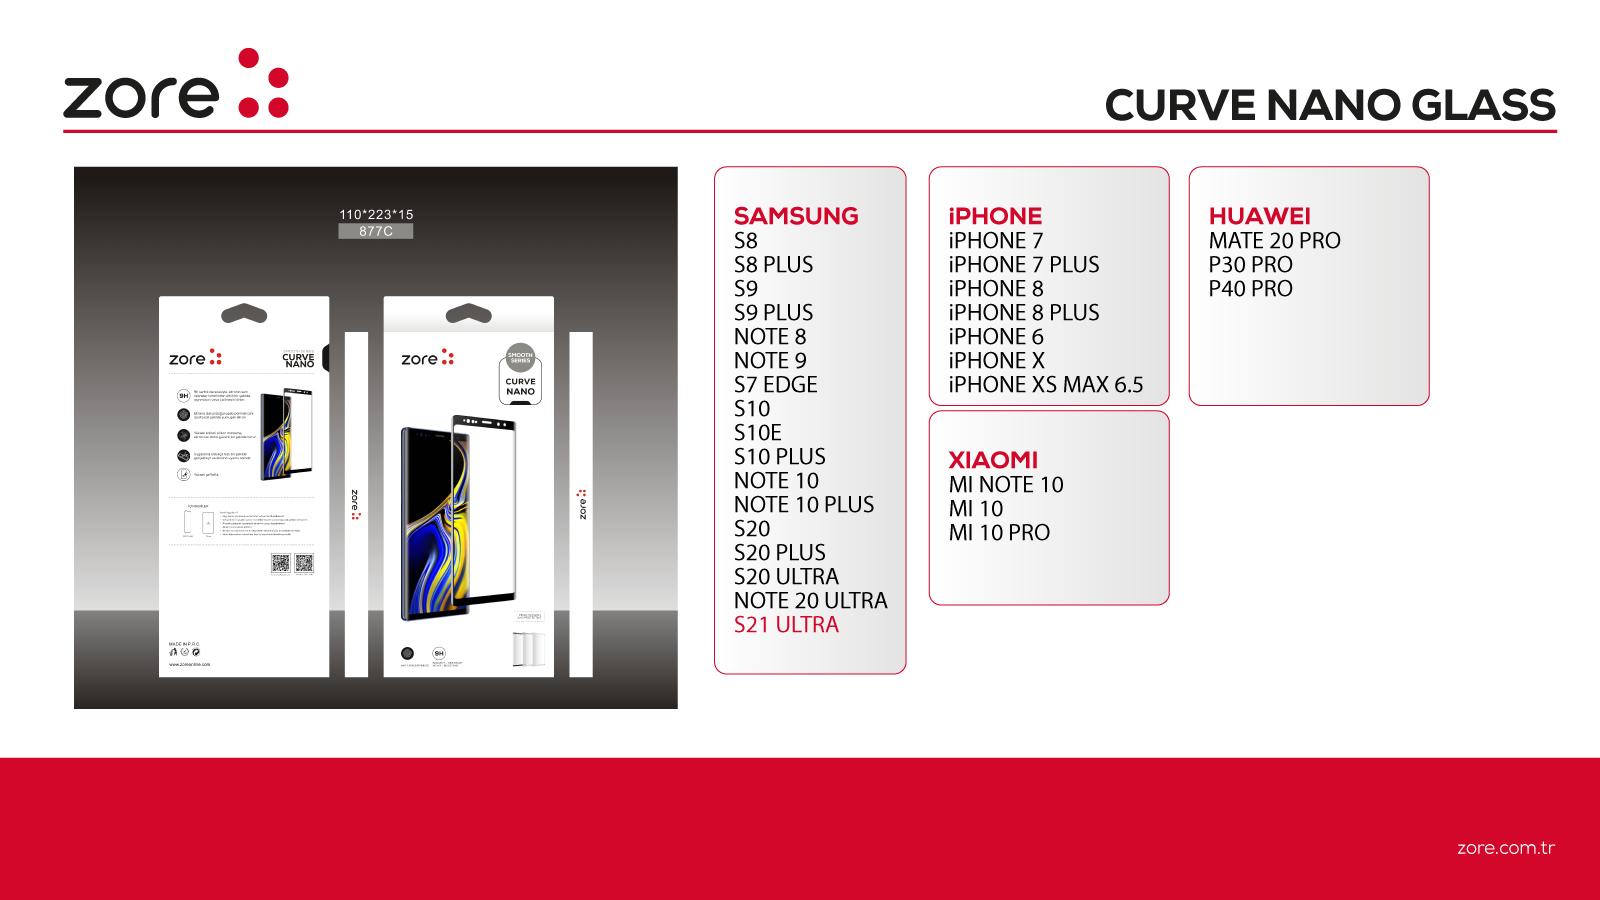 curve nano.jpg (277 KB)